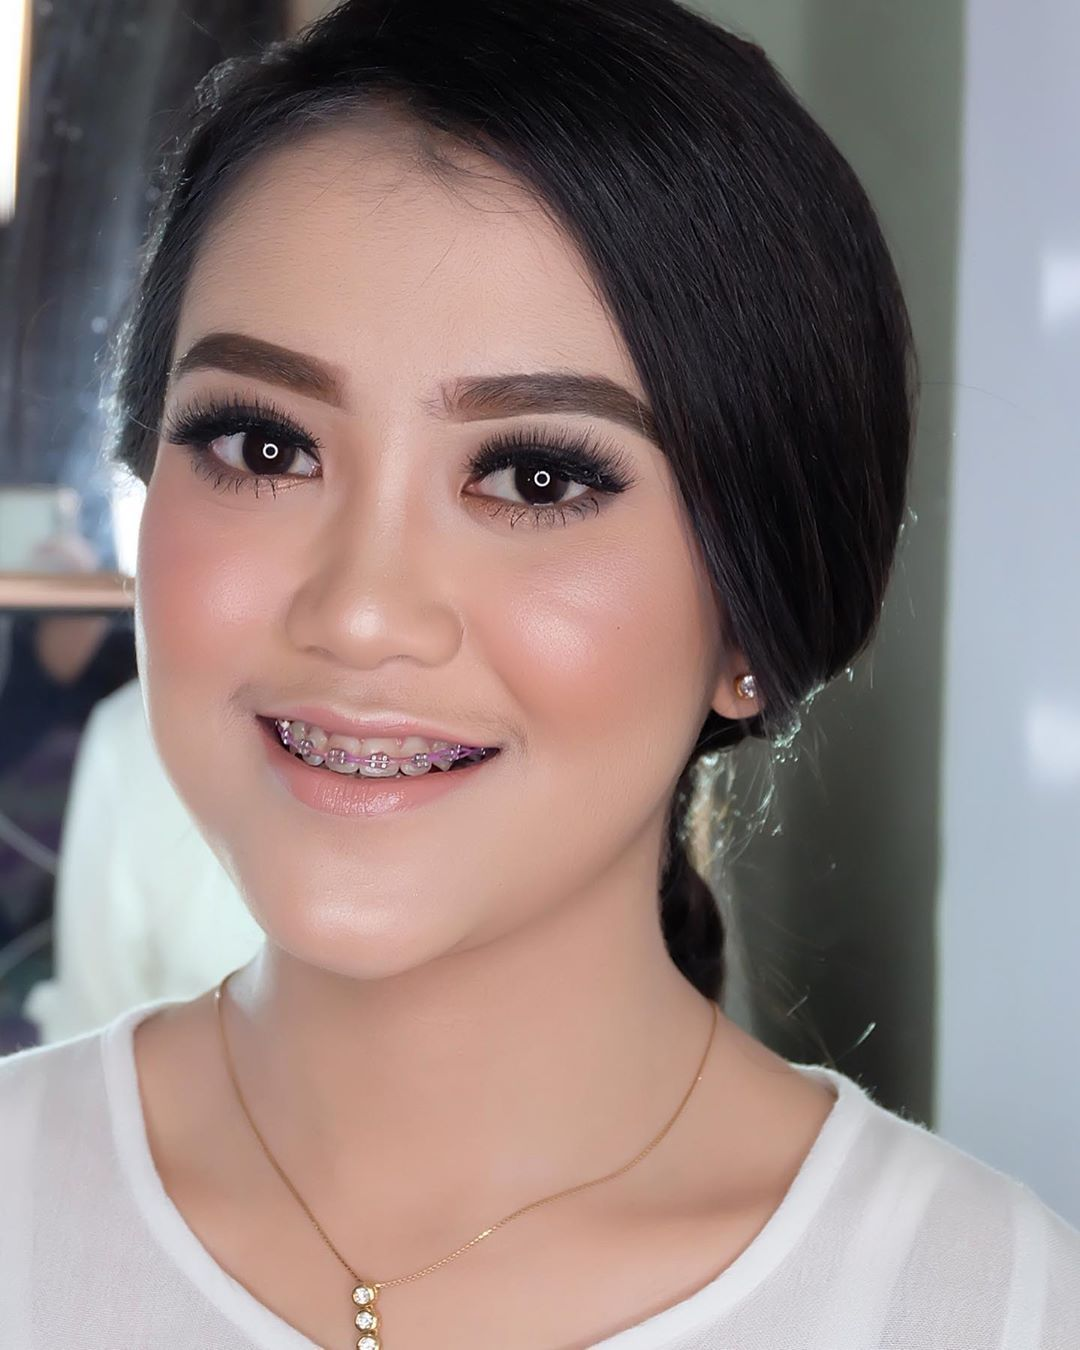 Beautiful Shafnafaiz Neng Geulis Dr Bandung Alhamdulillah Bisa Ketemu Lagi Thanks For Always Trusting Me Dear Makeup Pe Hairdo Hair Stylist Mua Makeup